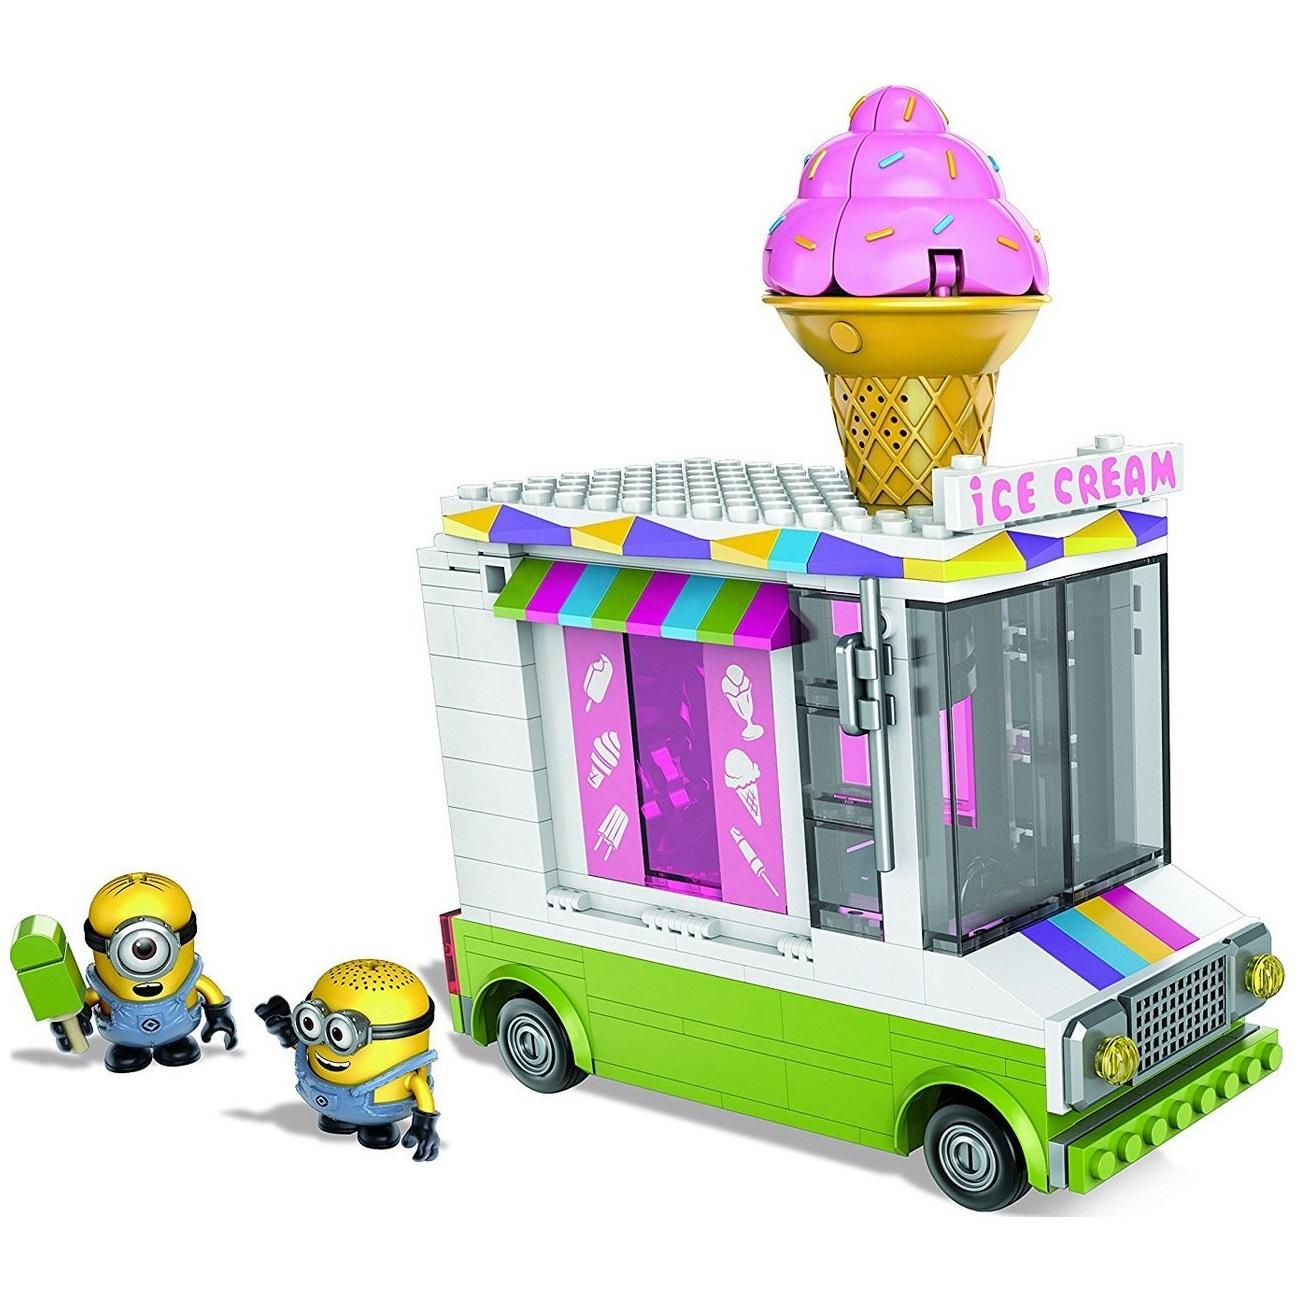 Фургончик с мороженым из серии Миньоны - Миньоны, артикул: 168090